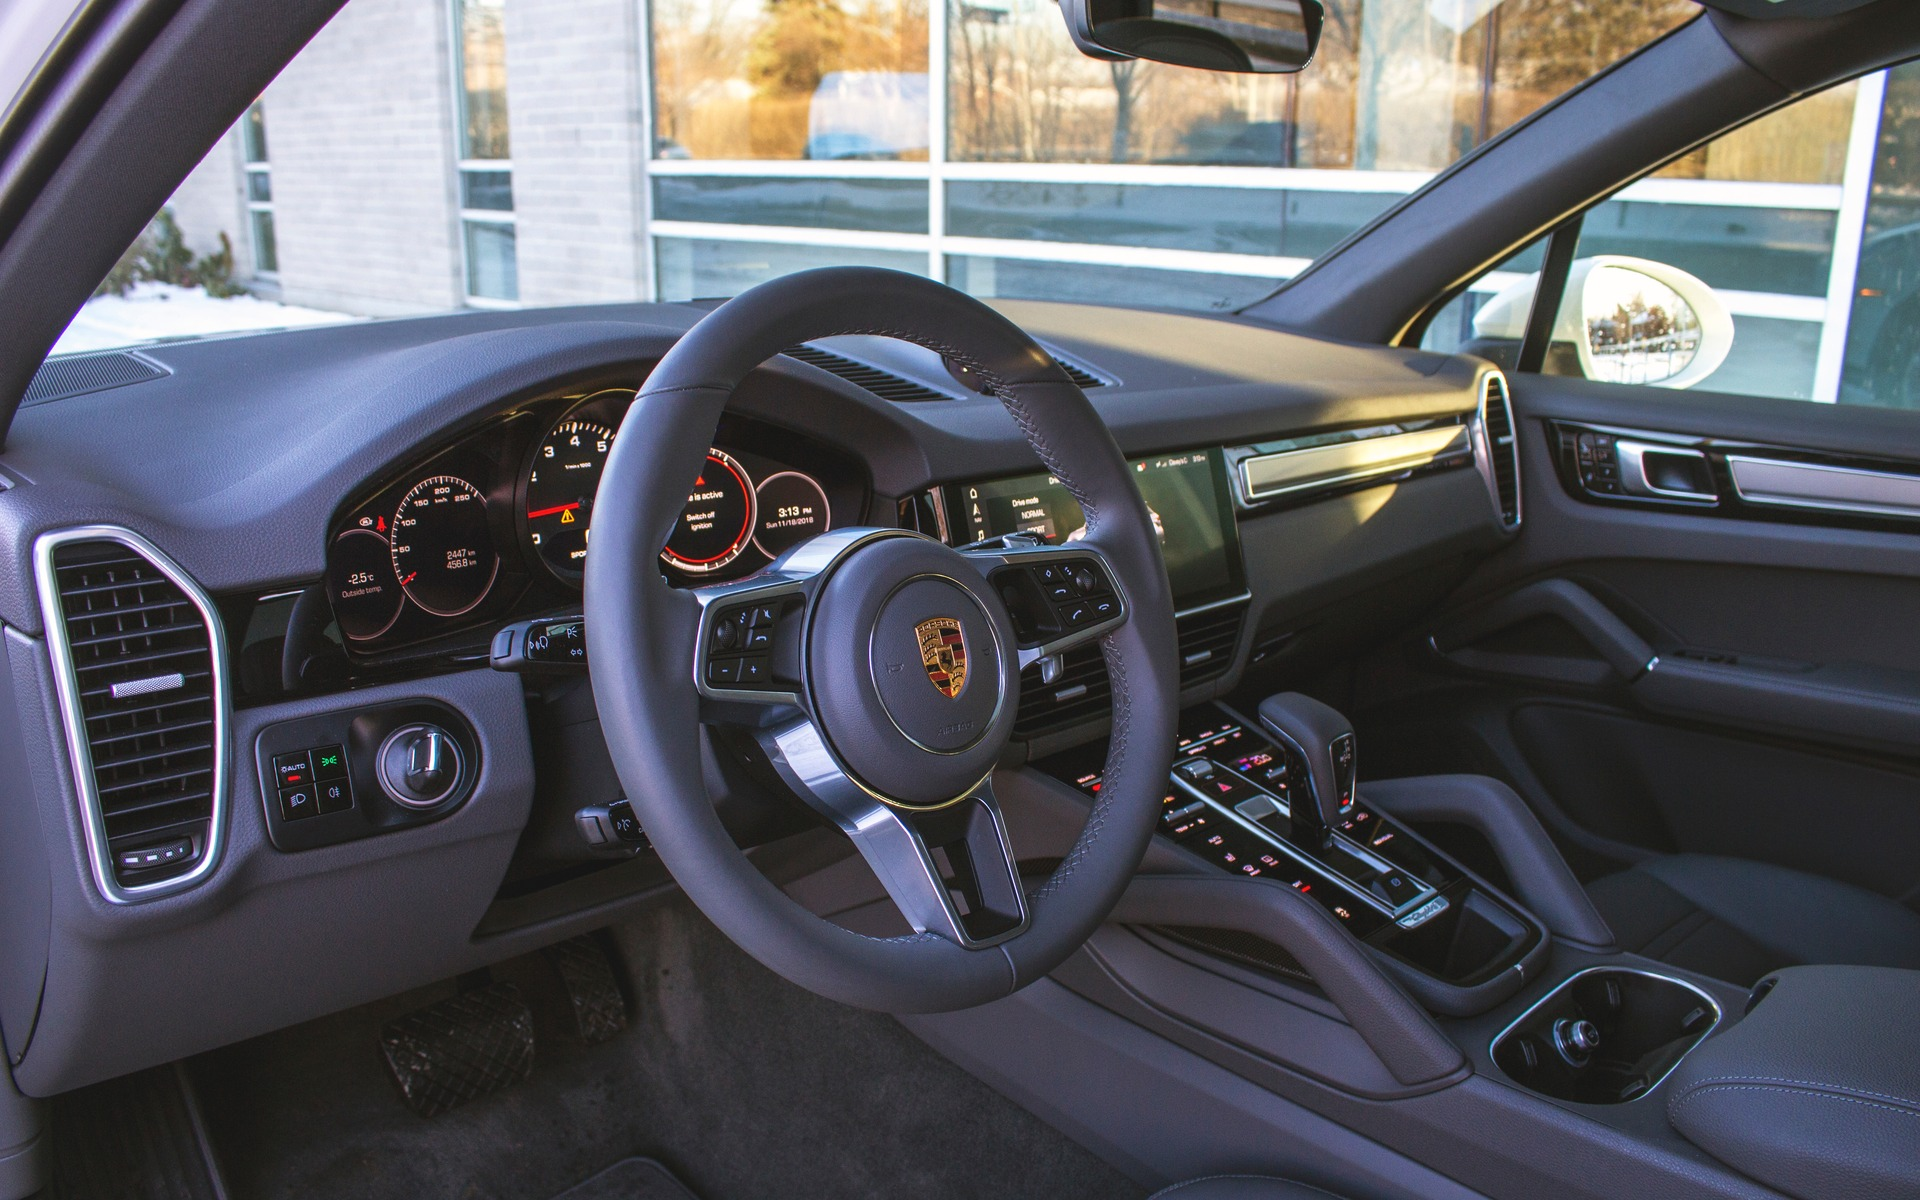 Porsche Cayenne 2019 : machine à tout faire 356638_2019_Porsche_Cayenne